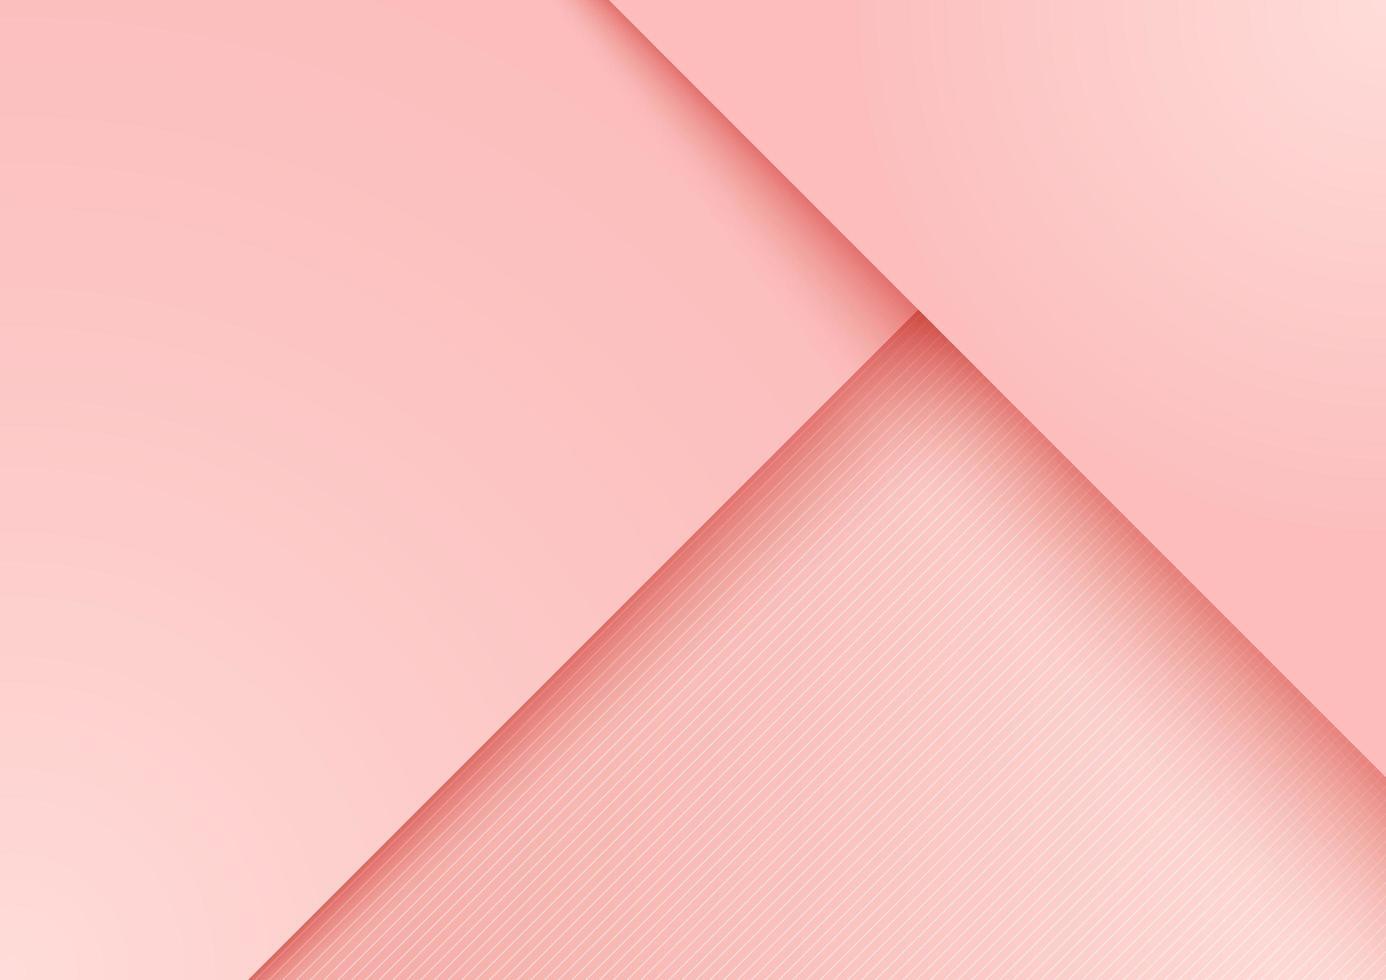 fundo de camada sobreposta de papel rosa vetor